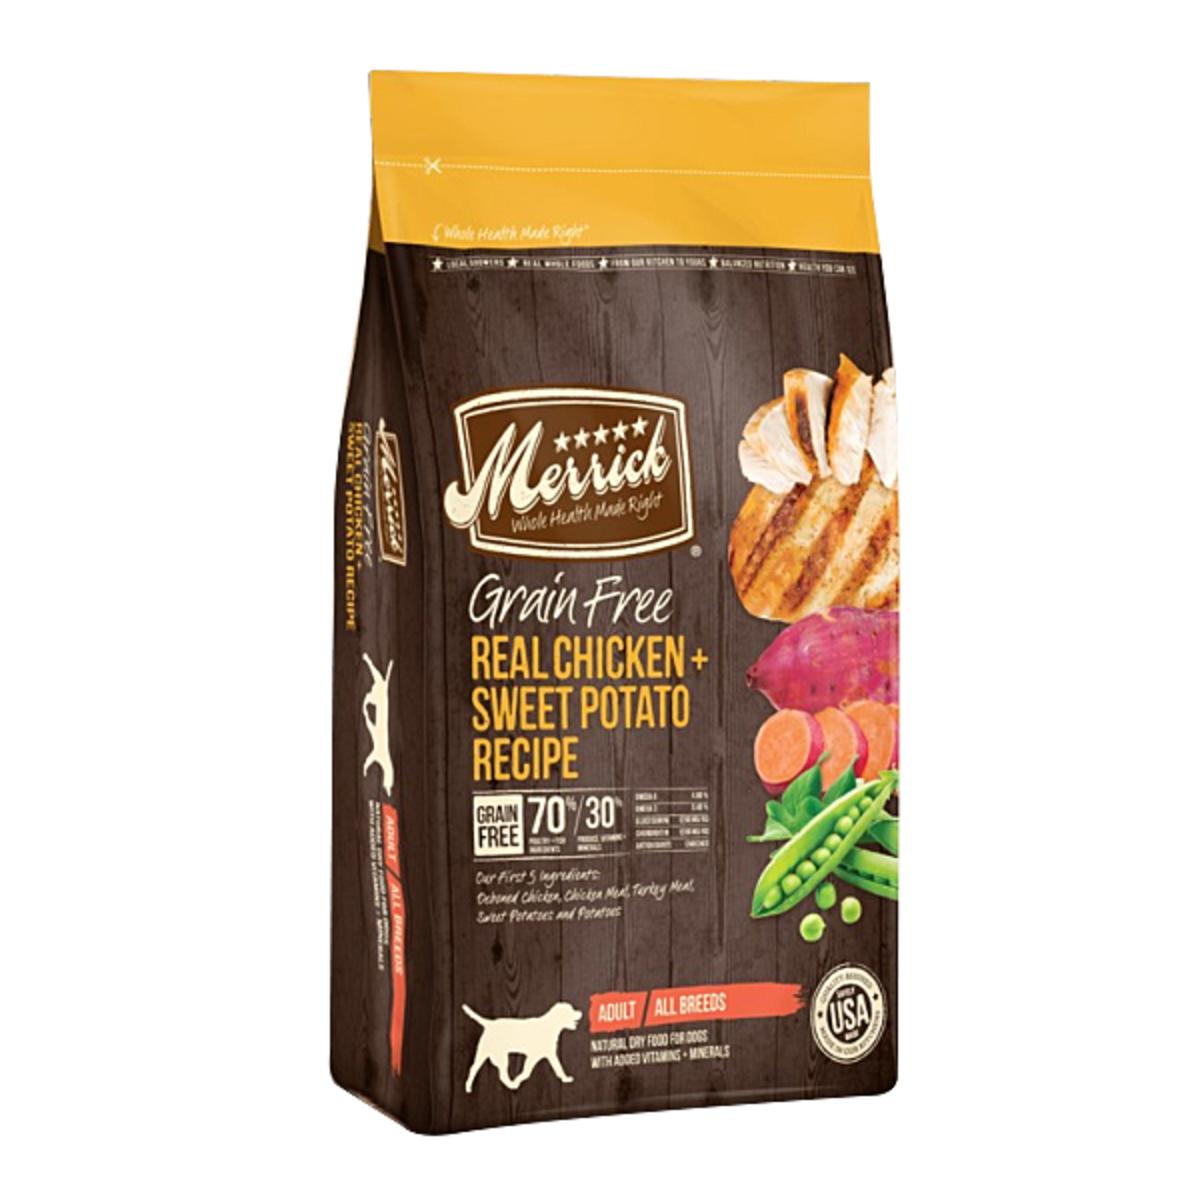 Grain Free Real Chicken & Sweet Potato Recipe - 25lb